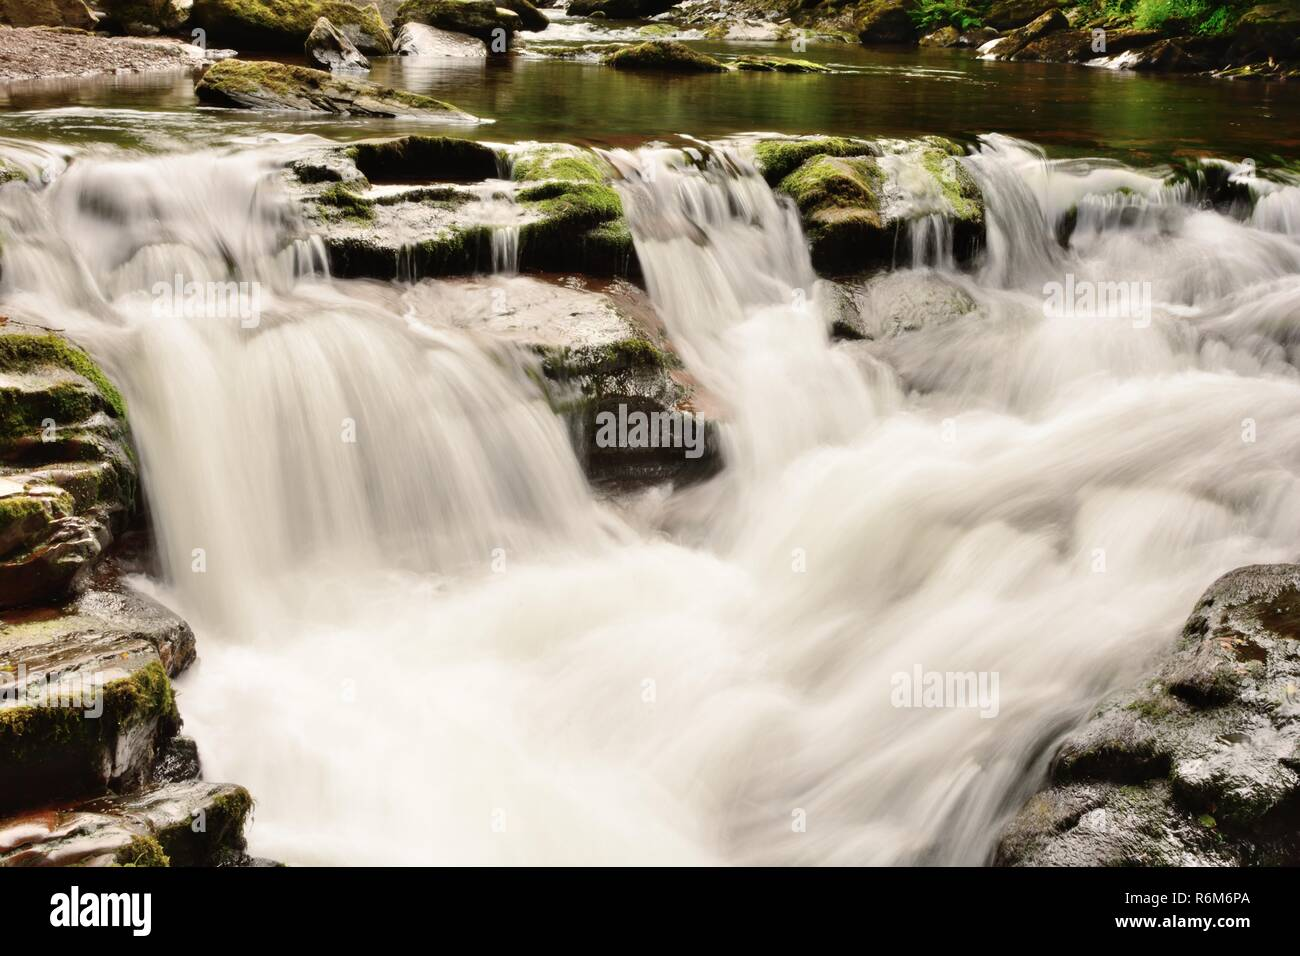 Long exposure of a waterfalll at Watersmeet in Devon - Stock Image